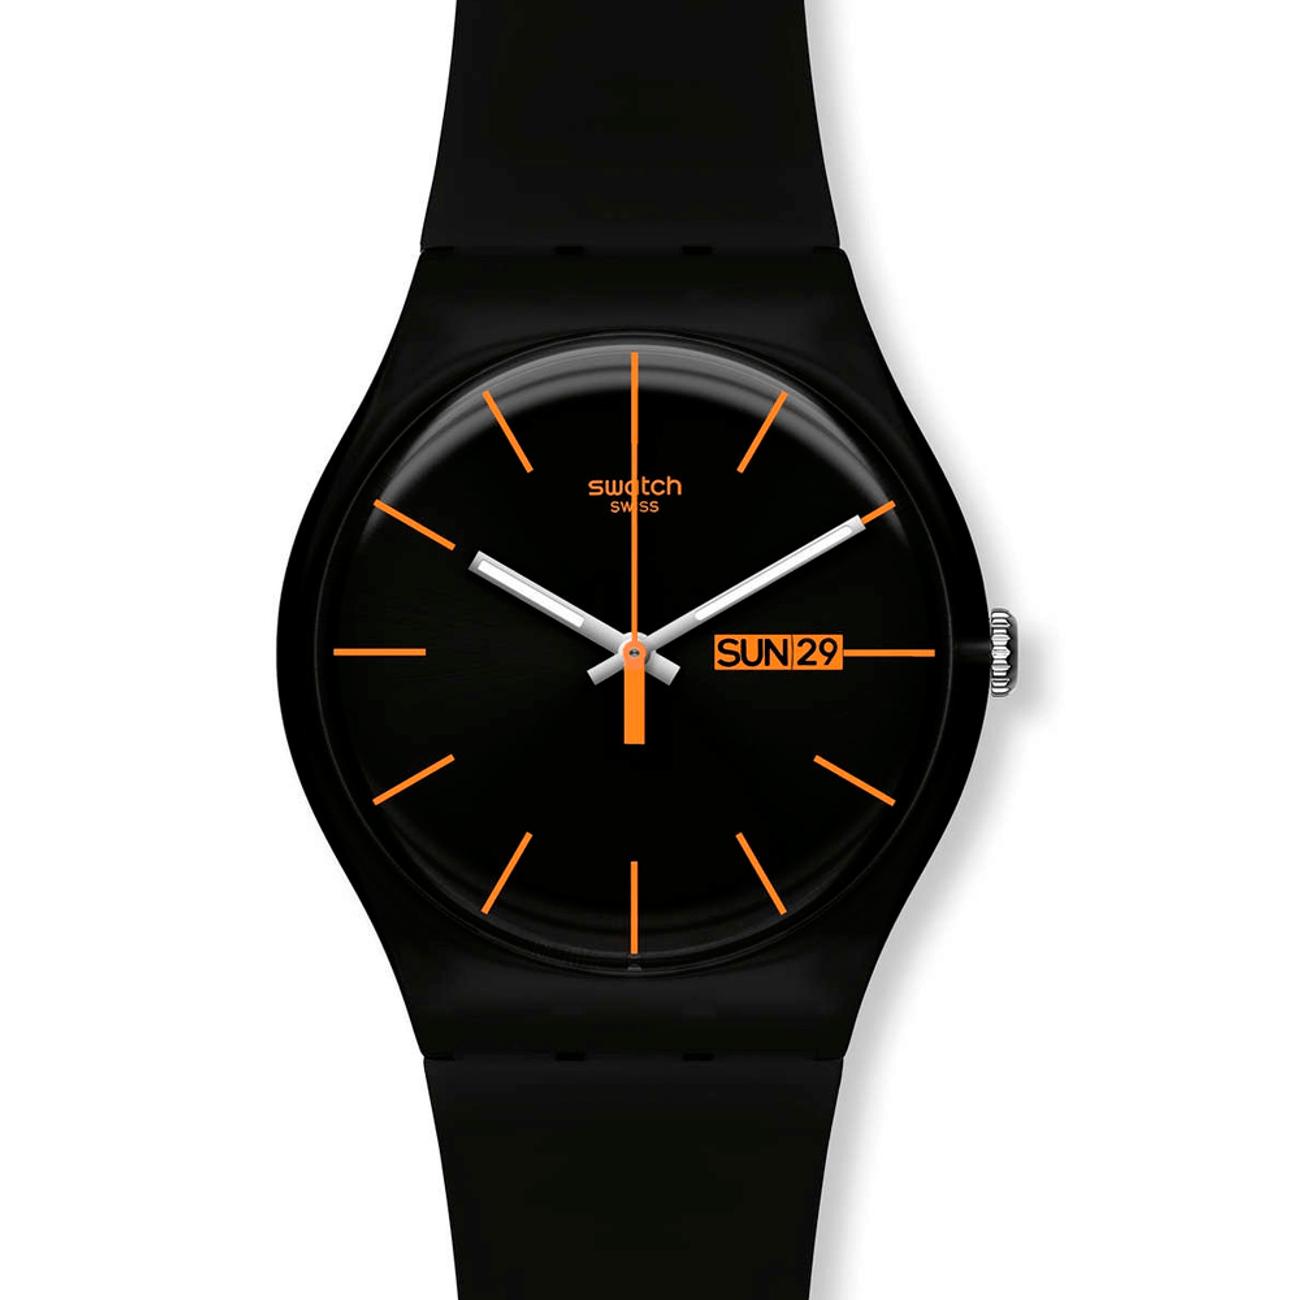 c9e550bc4428 Reloj Swatch Dark Rebel Hombre - Style Watch